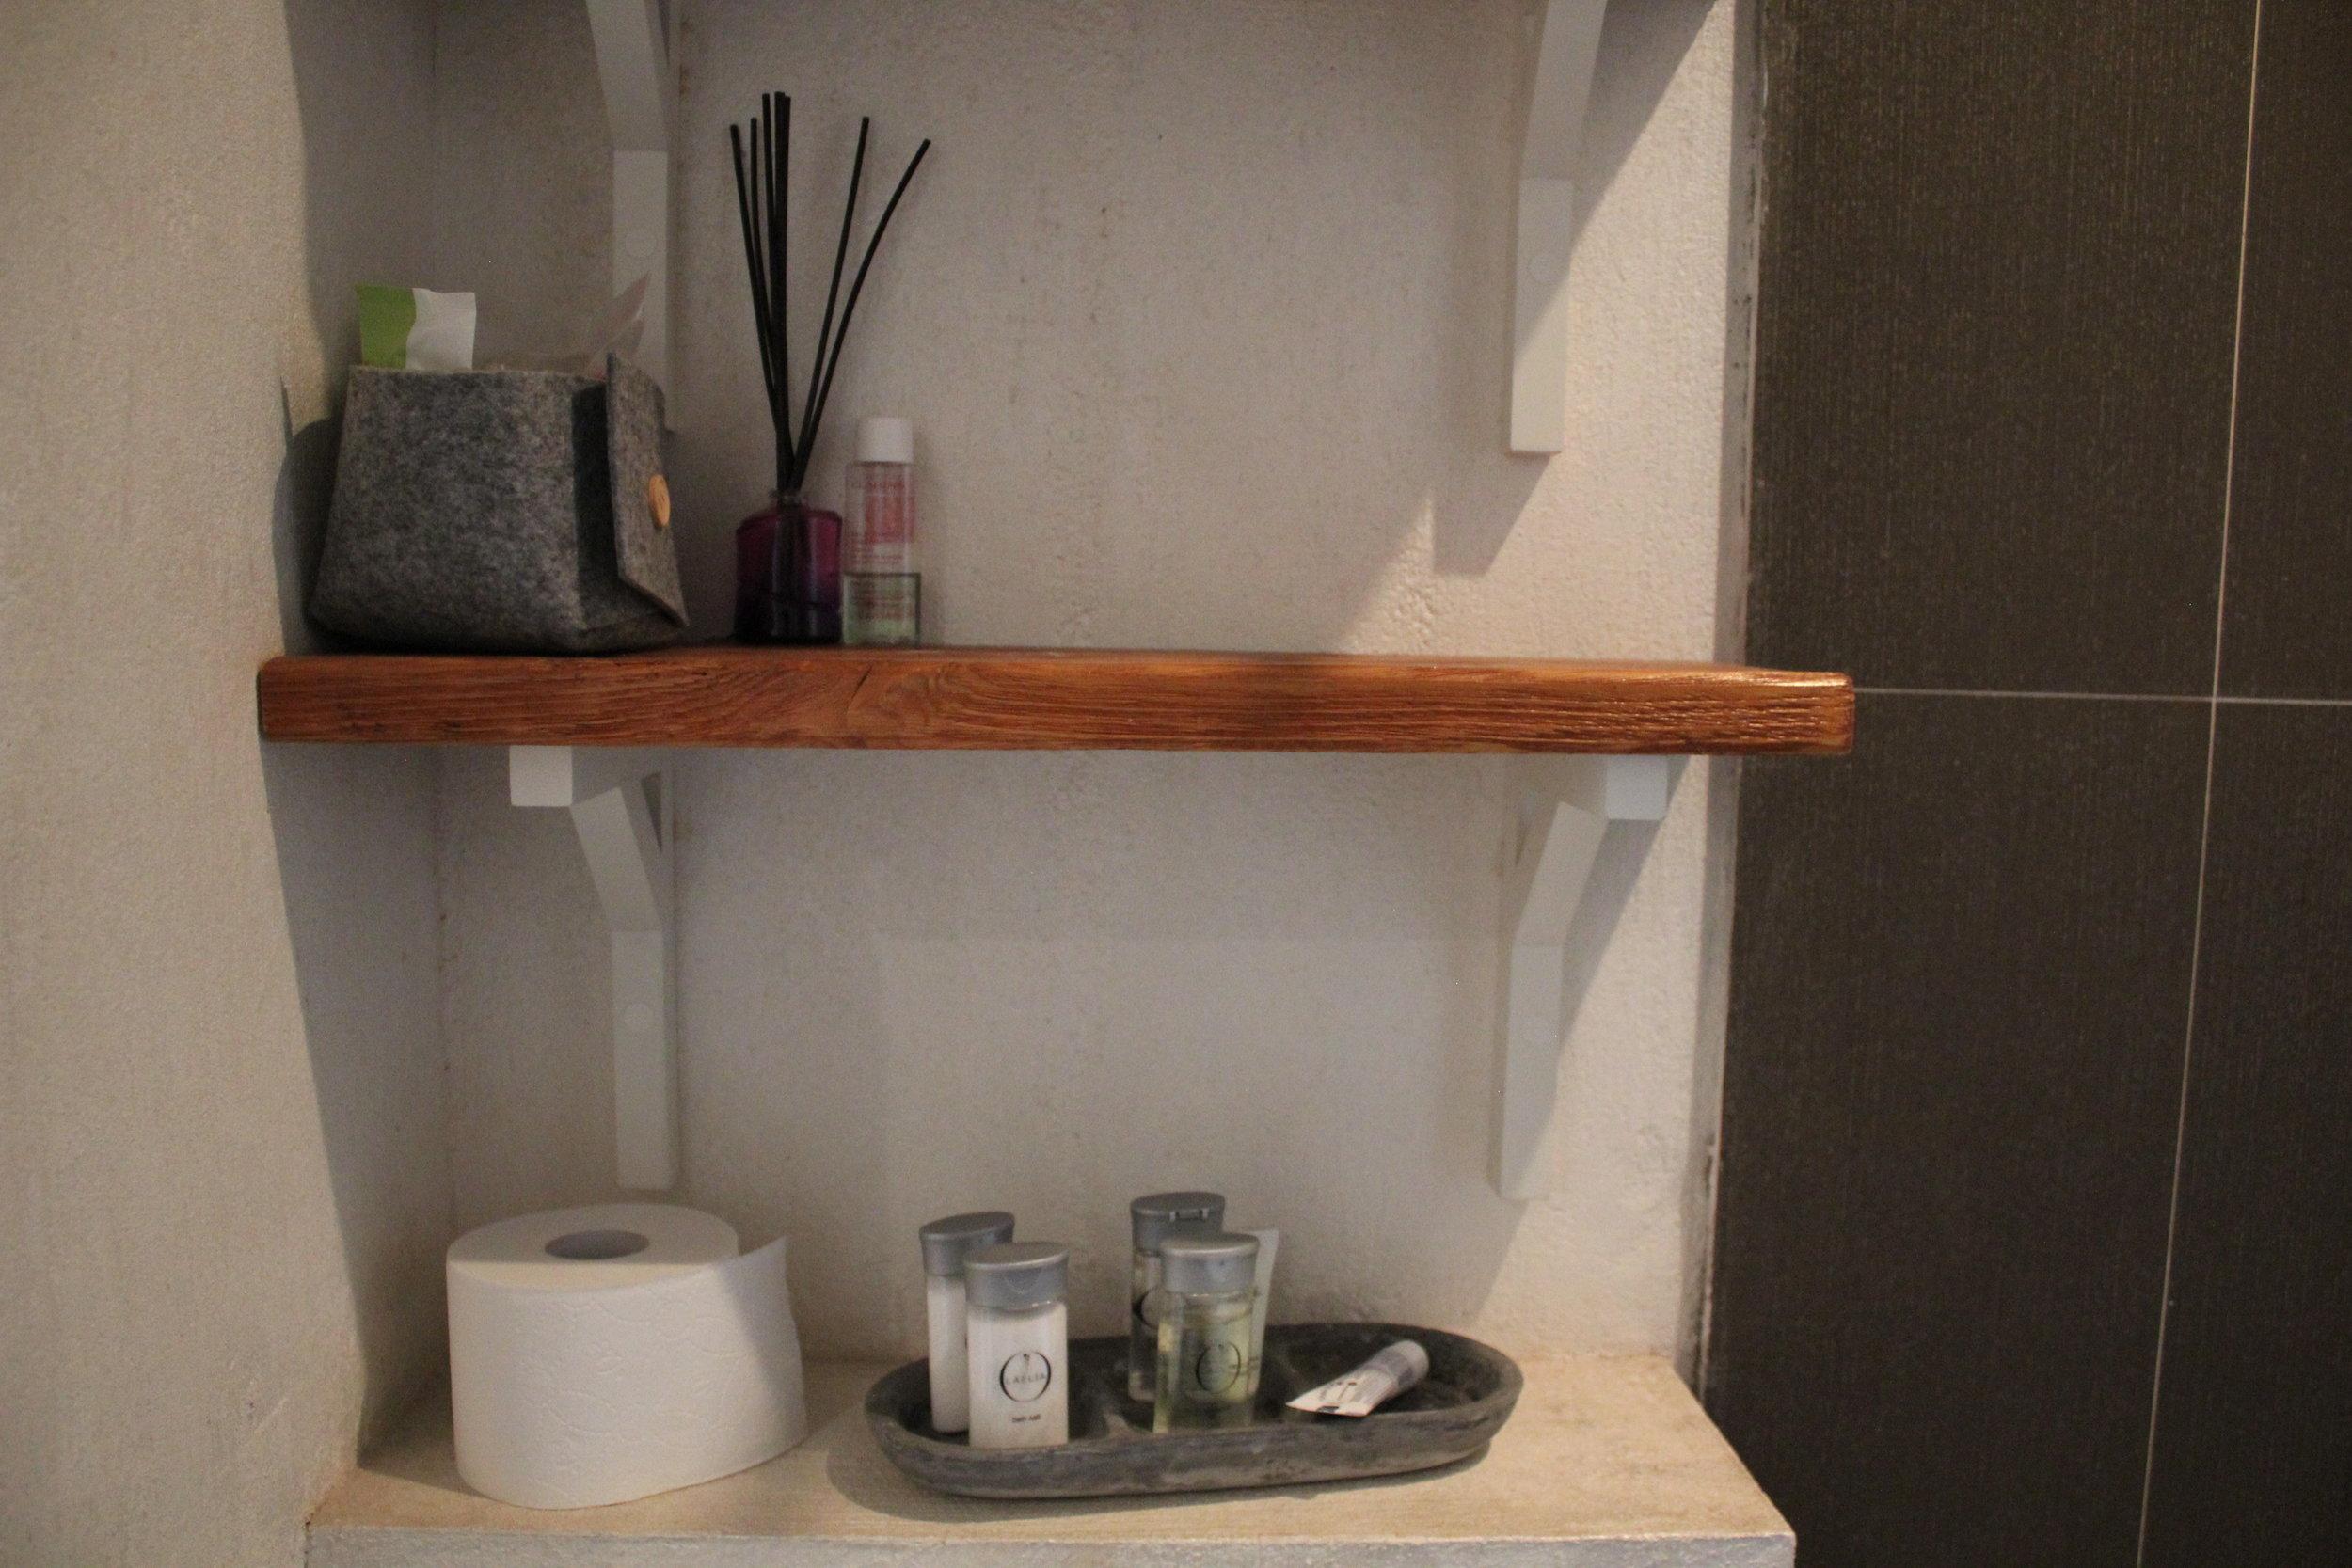 Apartament na Mariensztacie – Bathroom amenities